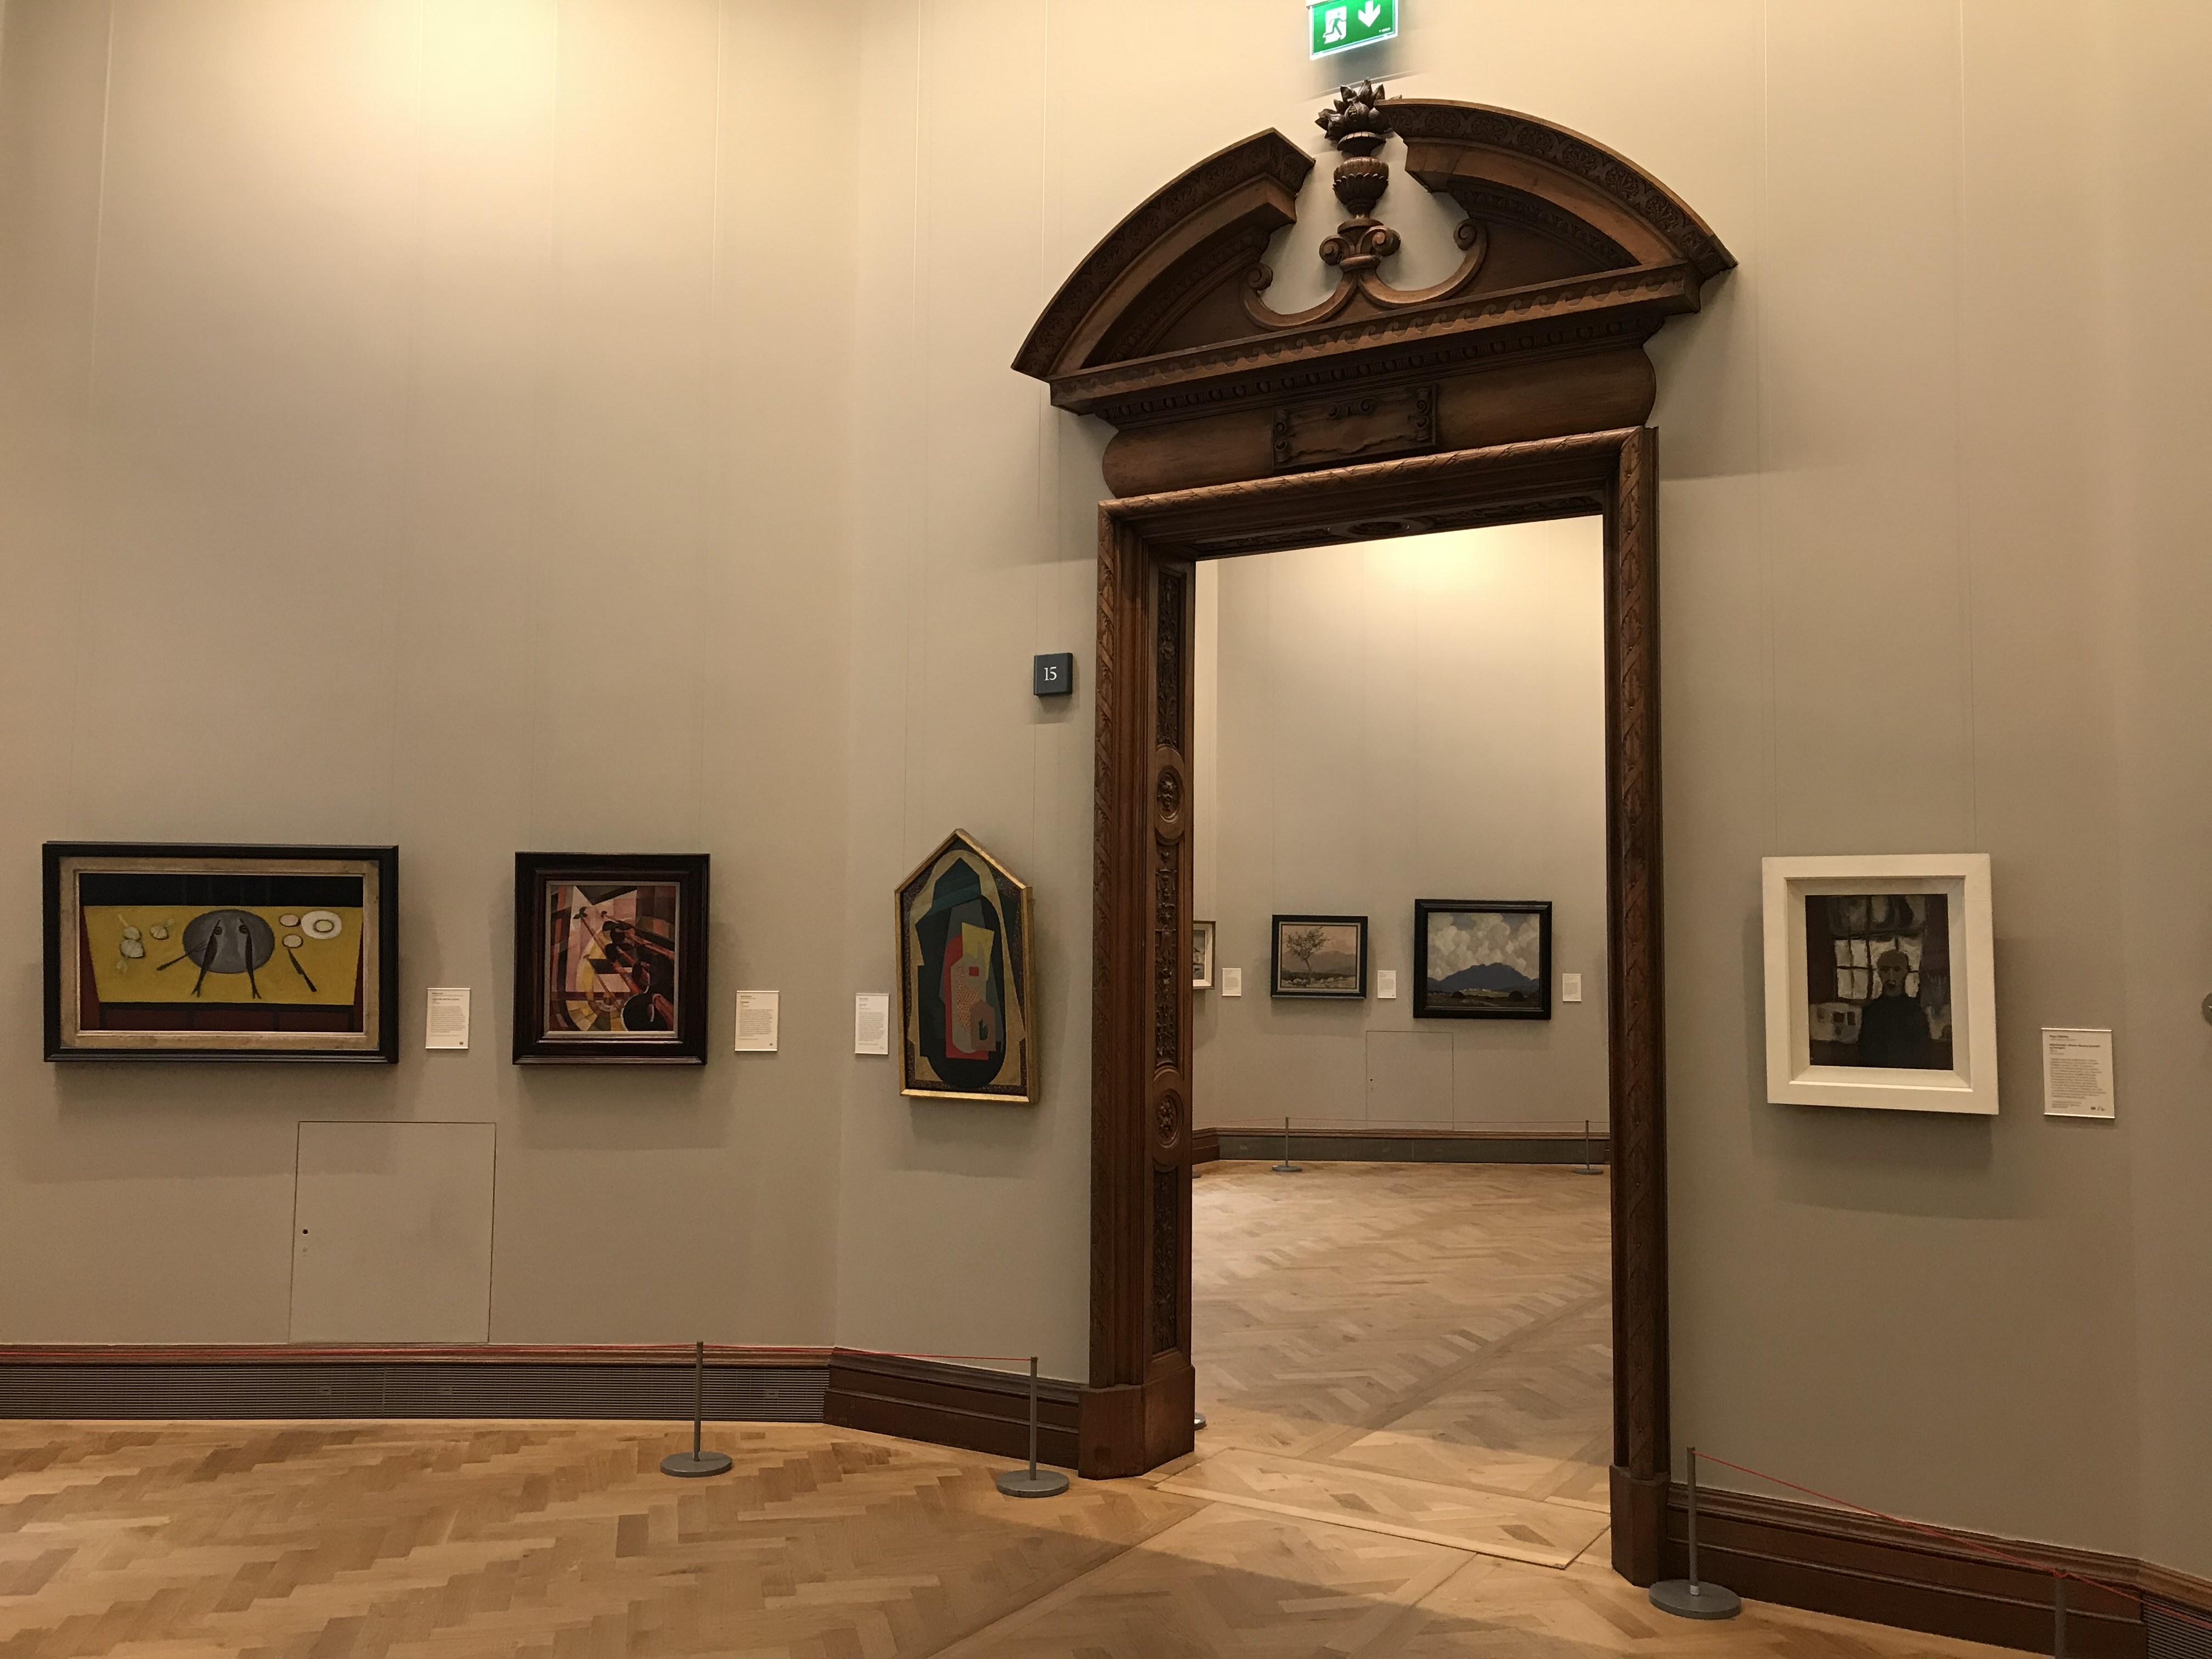 CAPAStudyAbroad_Dublin_Spring2018_From Brandon Mooney - Inside the National Gallery of Ireland.jpeg